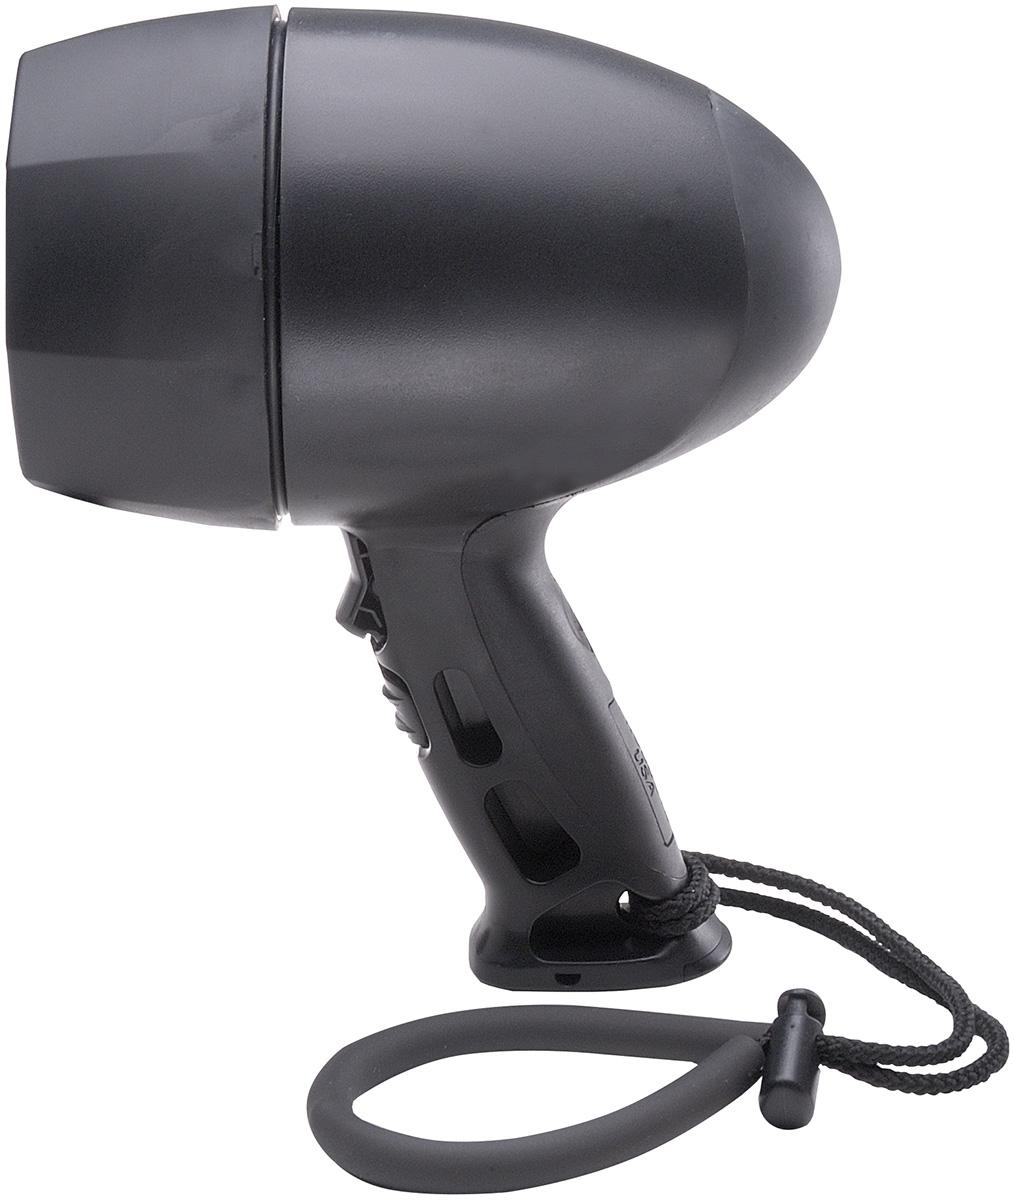 pelican peli products 4300N large light waterproof dive flashlight